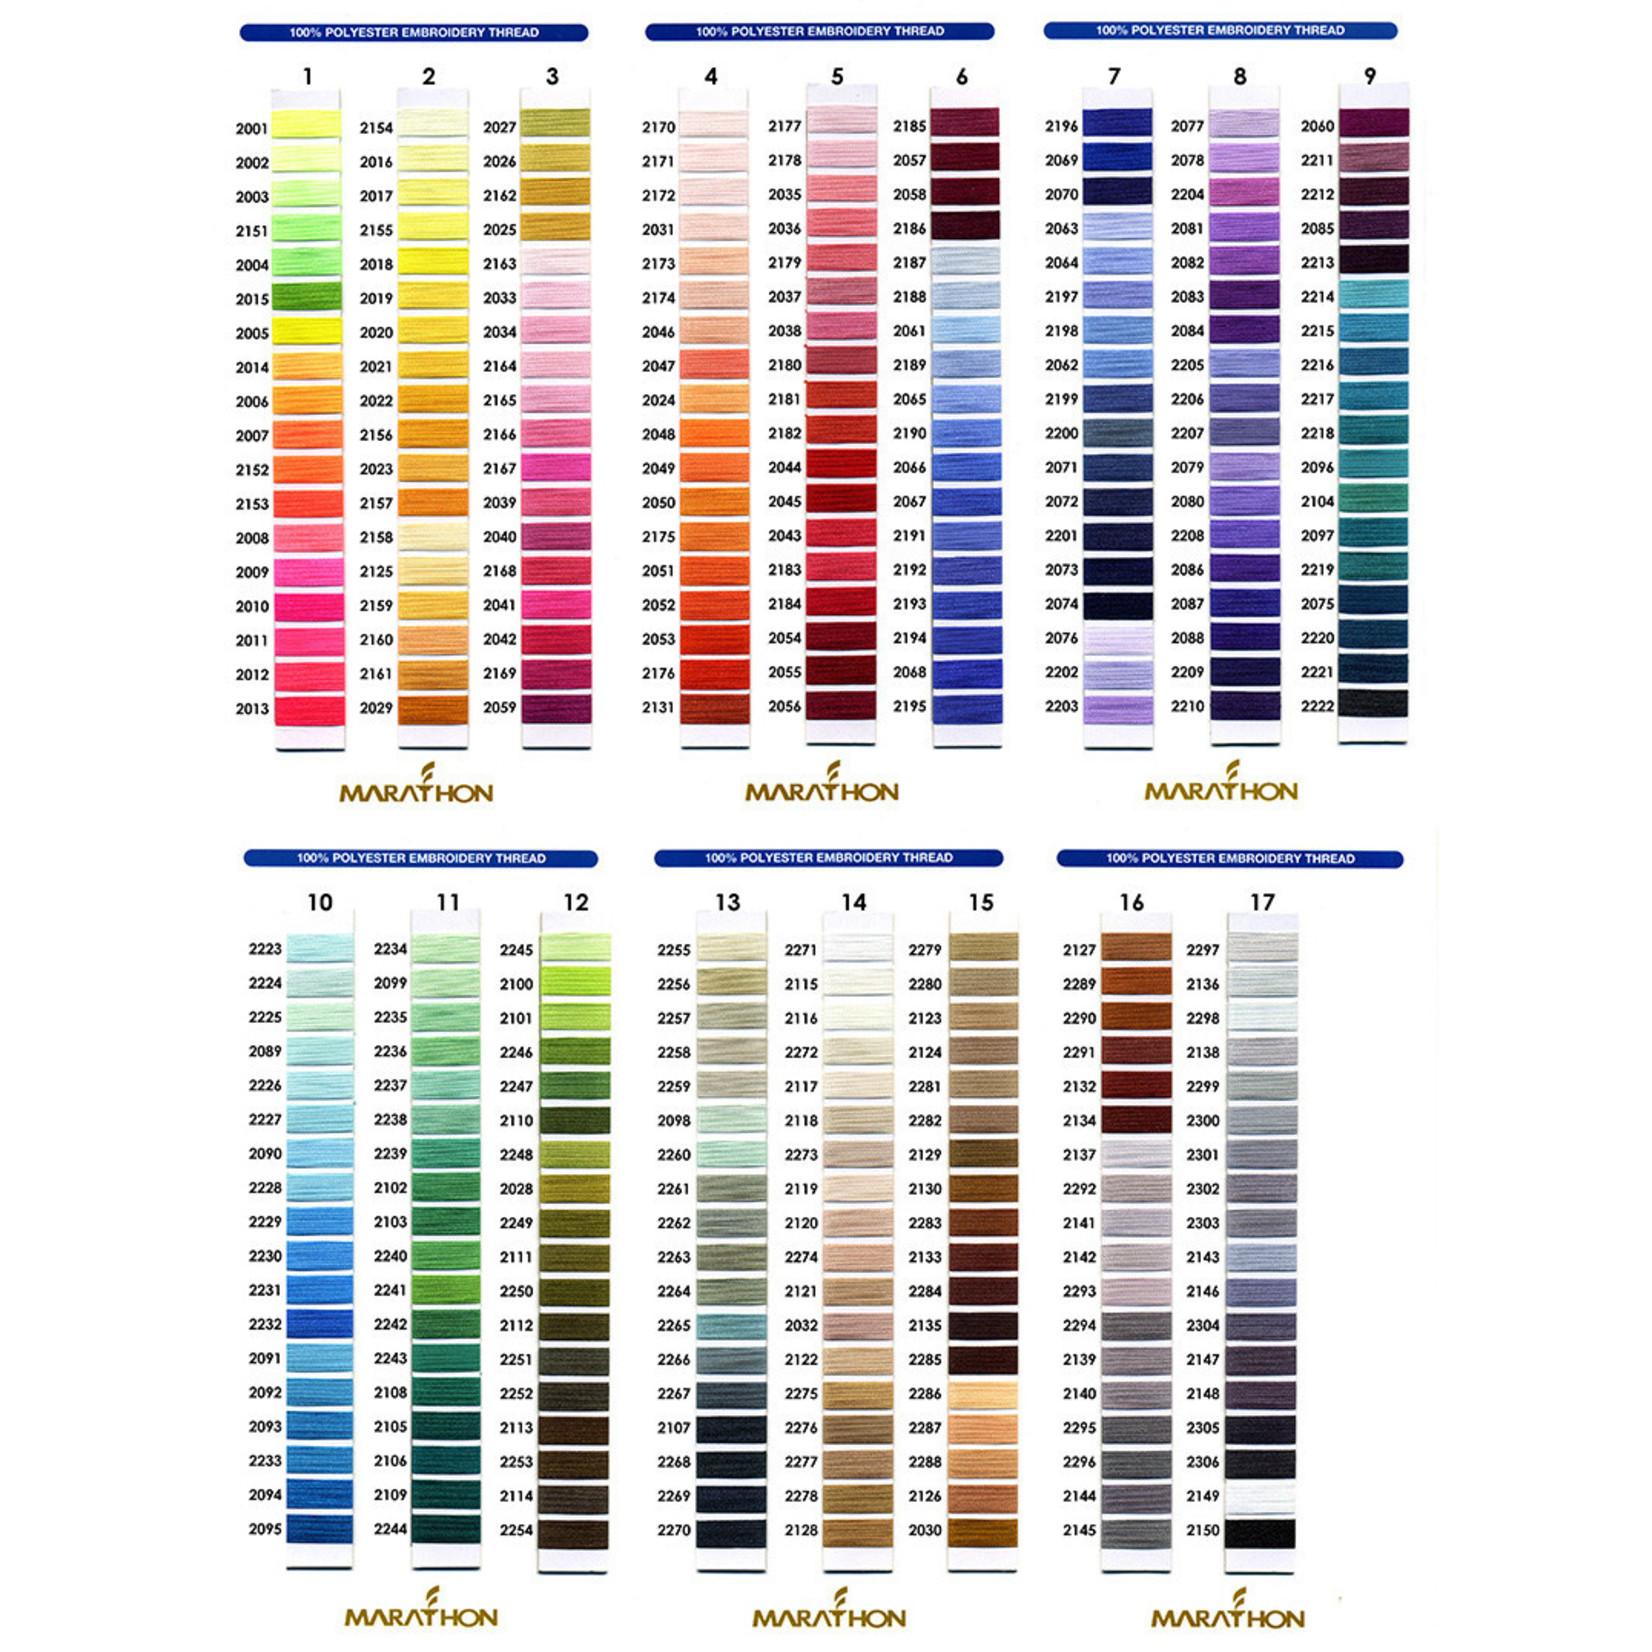 MARATHON Colour 2281 - 5000mtr POLY EMBROIDERY THREAD